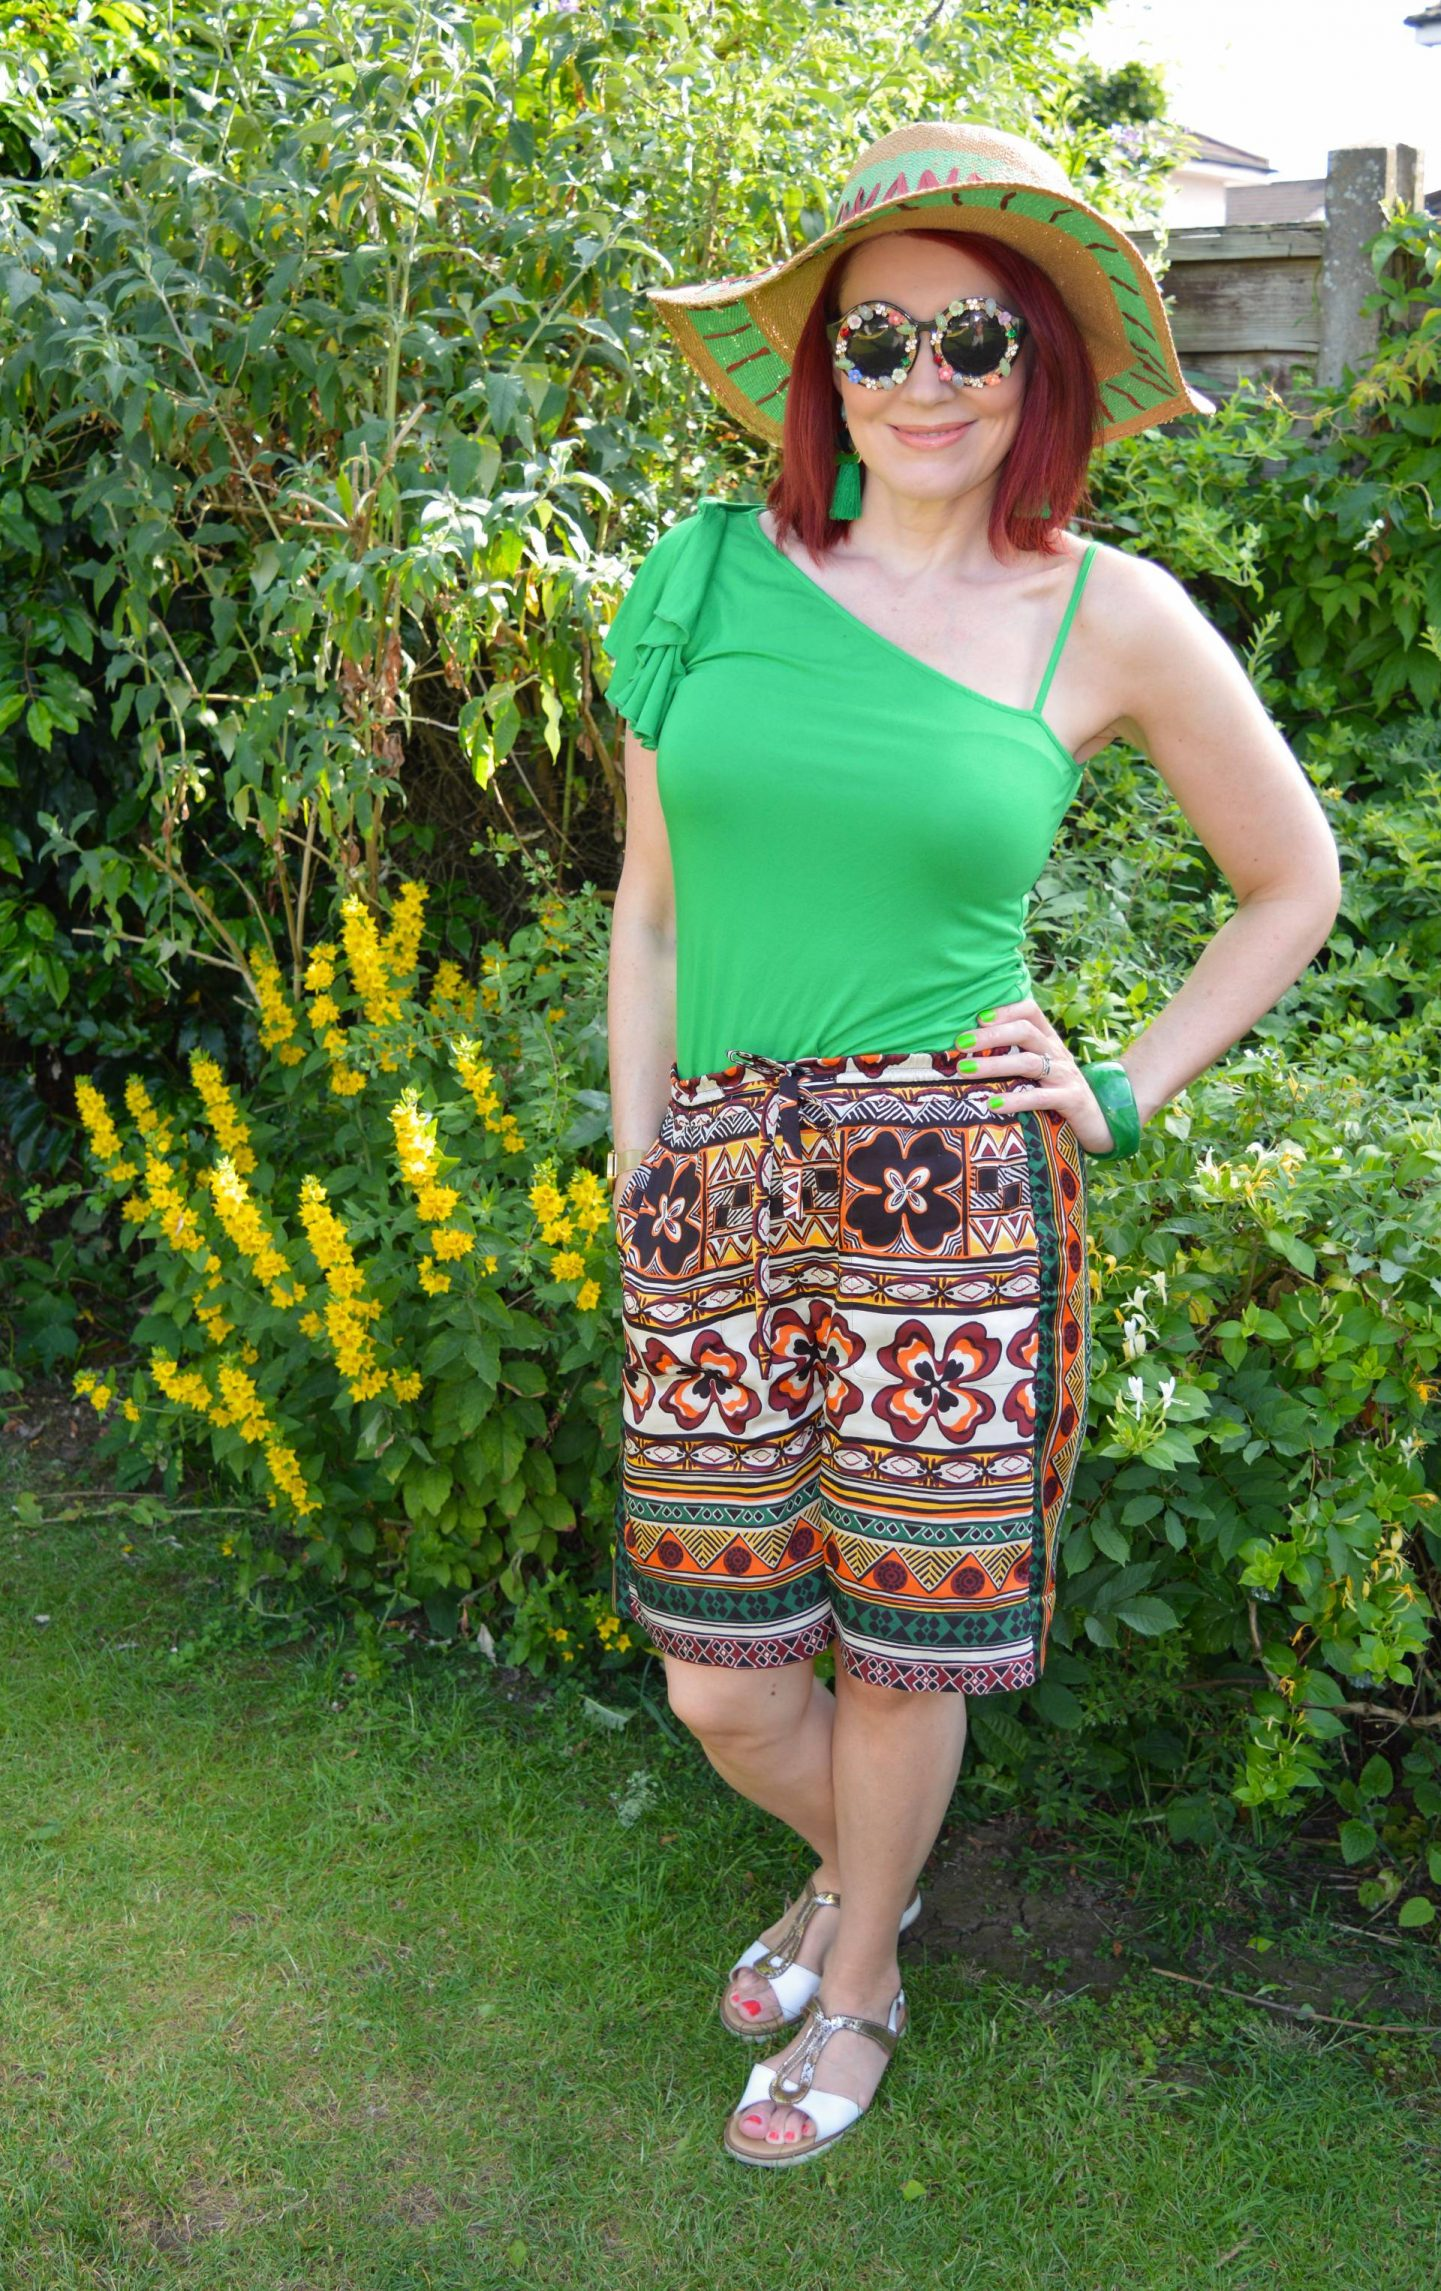 Karen Millen green one shoulder top, Zara print bermuda shorts, Oliver Bonas  wanderlust hat, Katy Perry embellished sunglasses